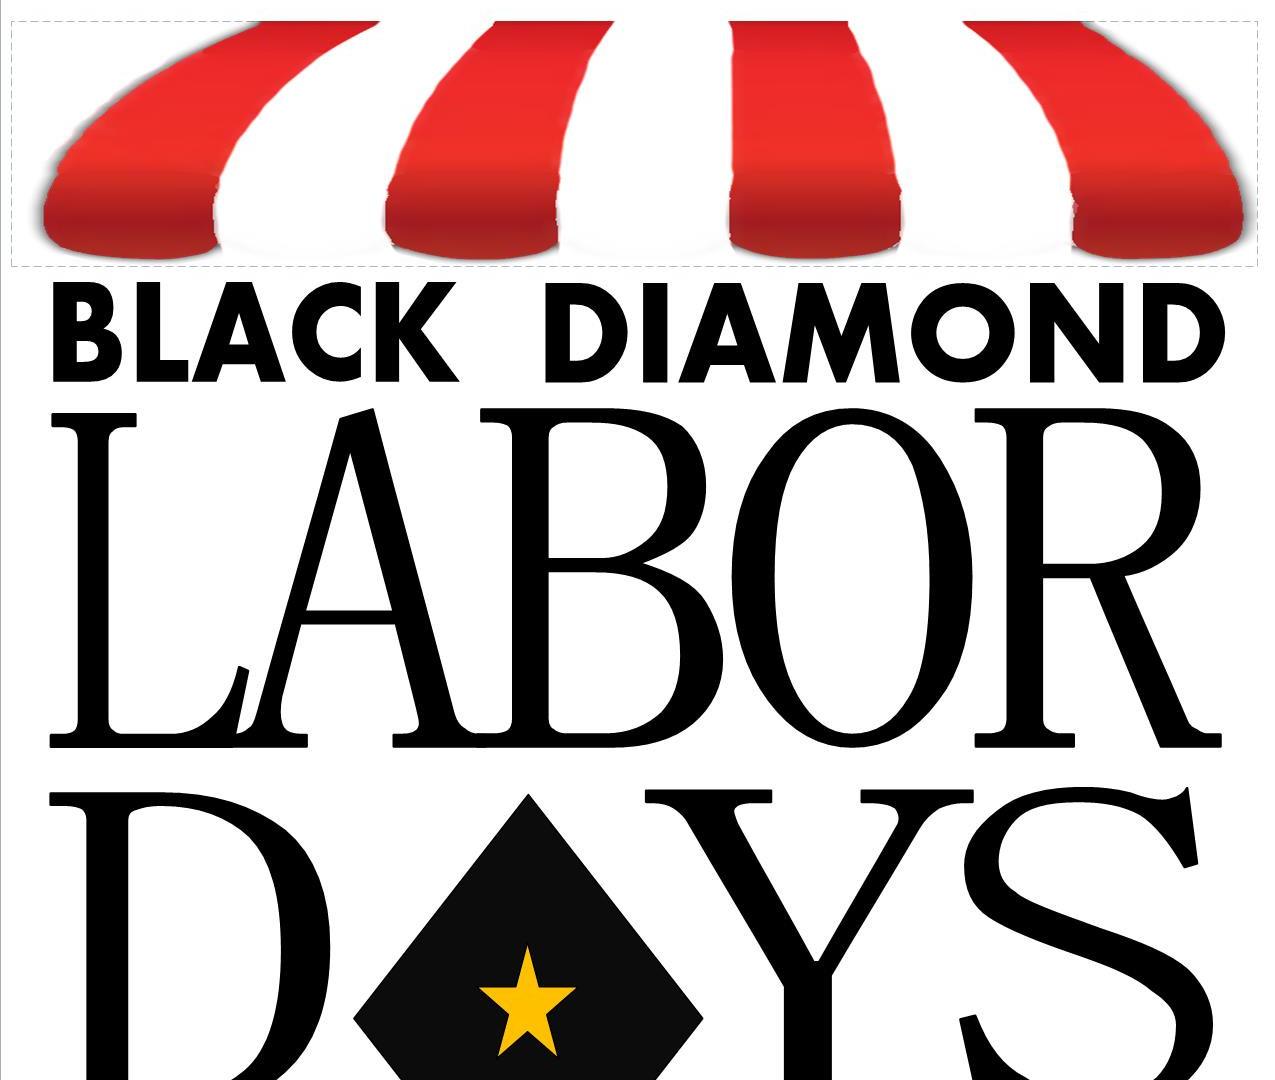 Black Diamond Labor Days logo